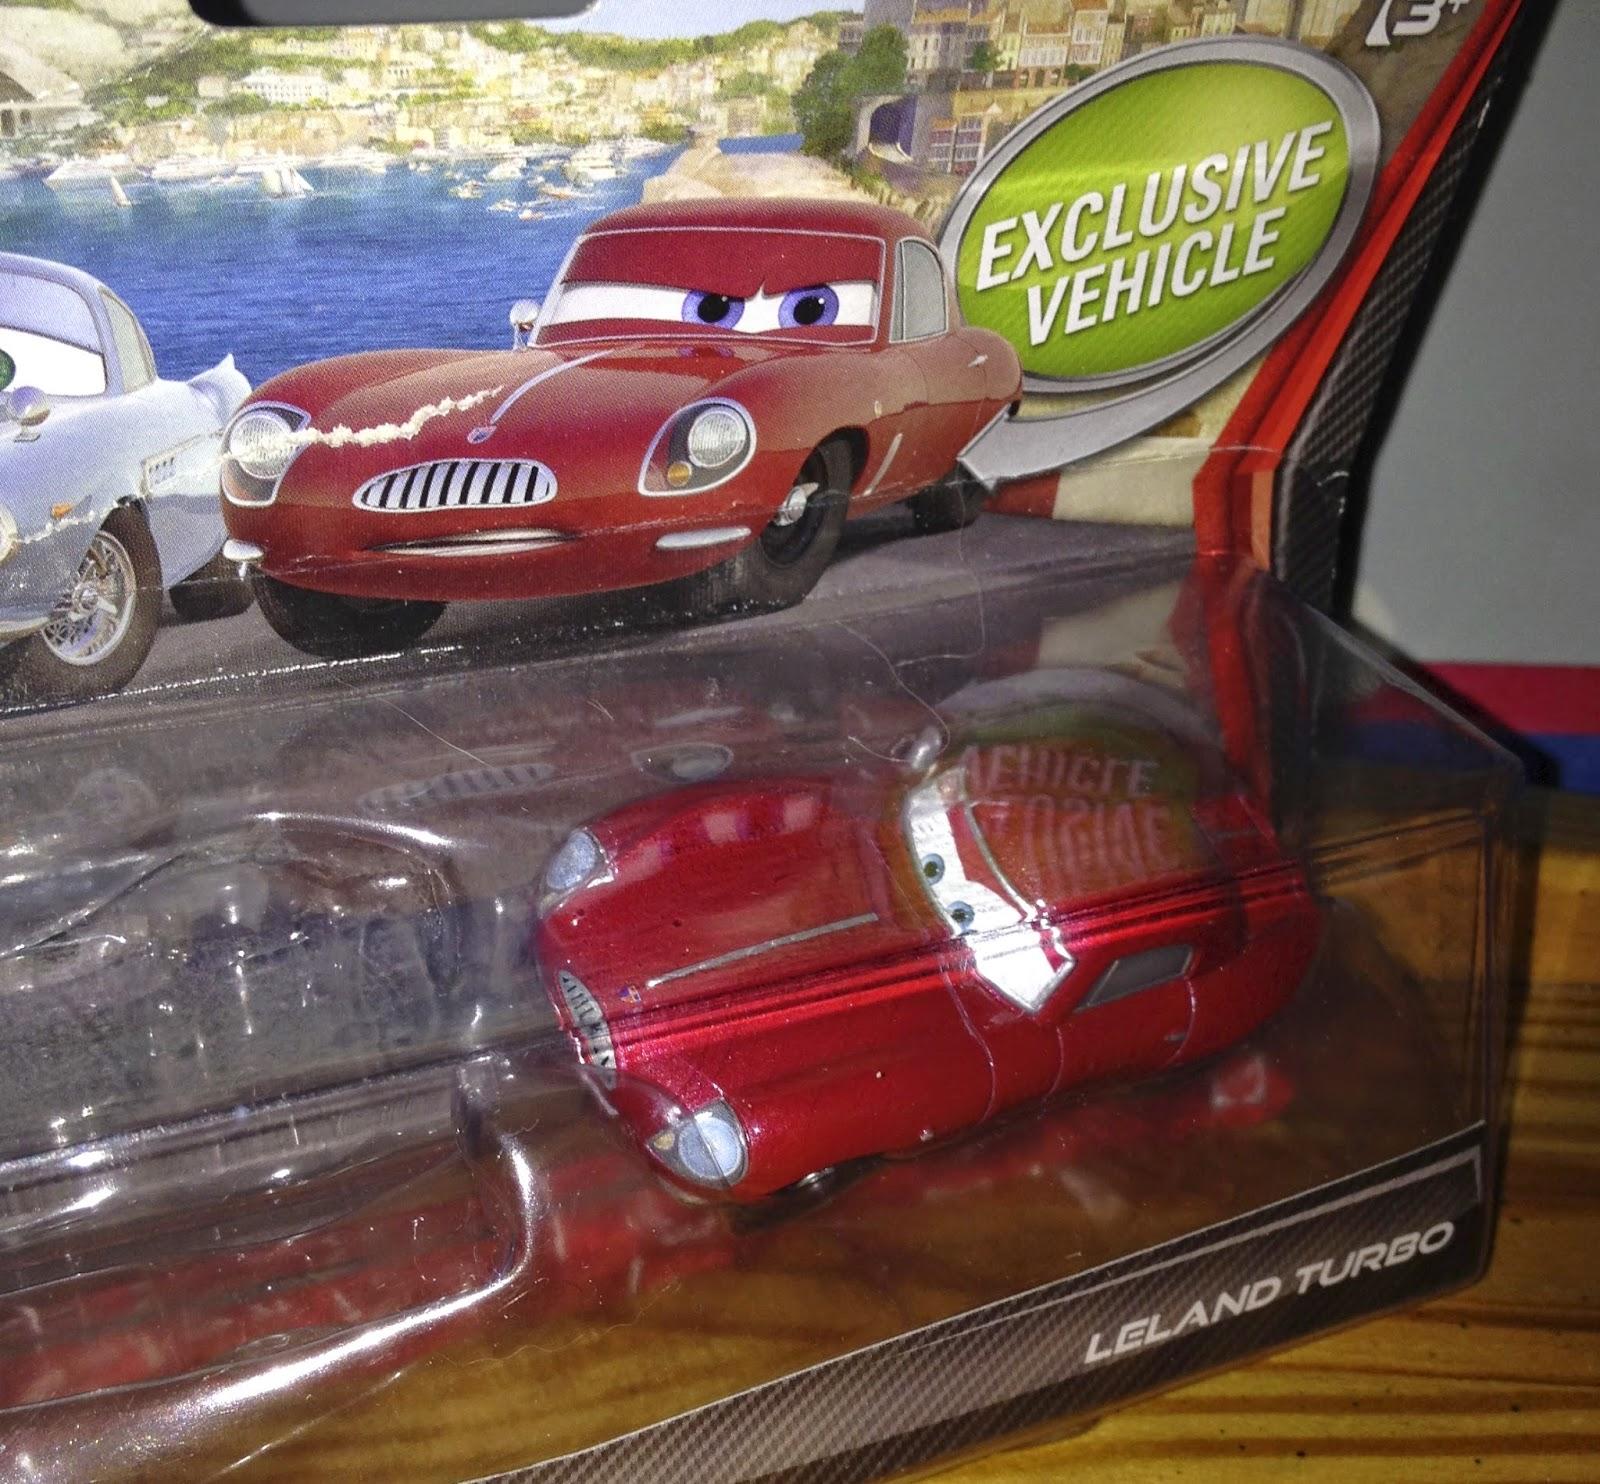 Finn Mcmissile Giocattolo Mattel Disney 1 55 Cars Auto: Dan The Pixar Fan: Cars 2: Leland Turbo